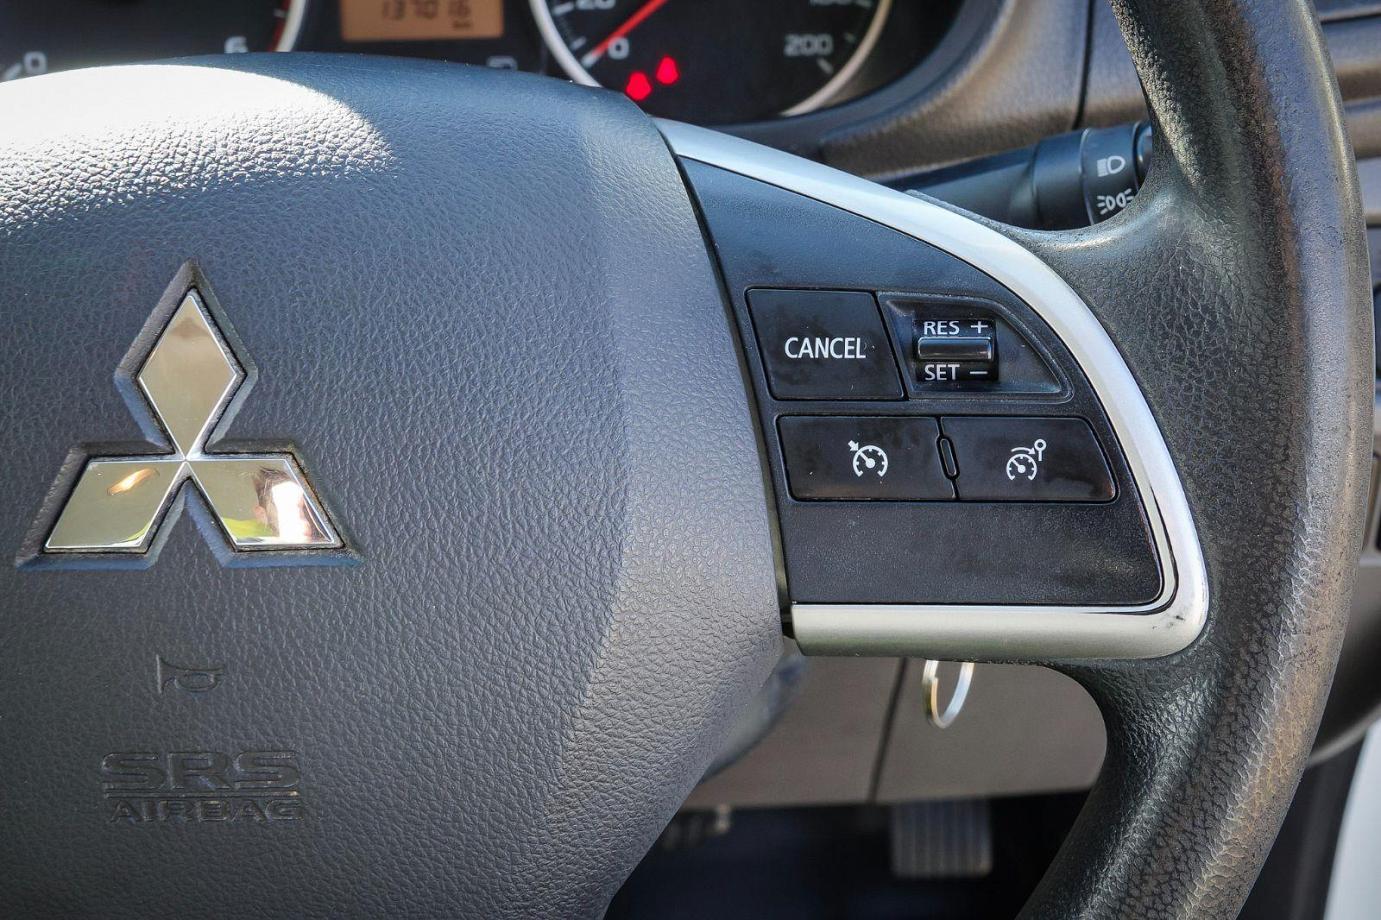 2016 Mitsubishi Triton MQ MY16 GLX+ Utility Double Cab 4dr Spts Auto 5sp 4x4 980kg 2.4DT